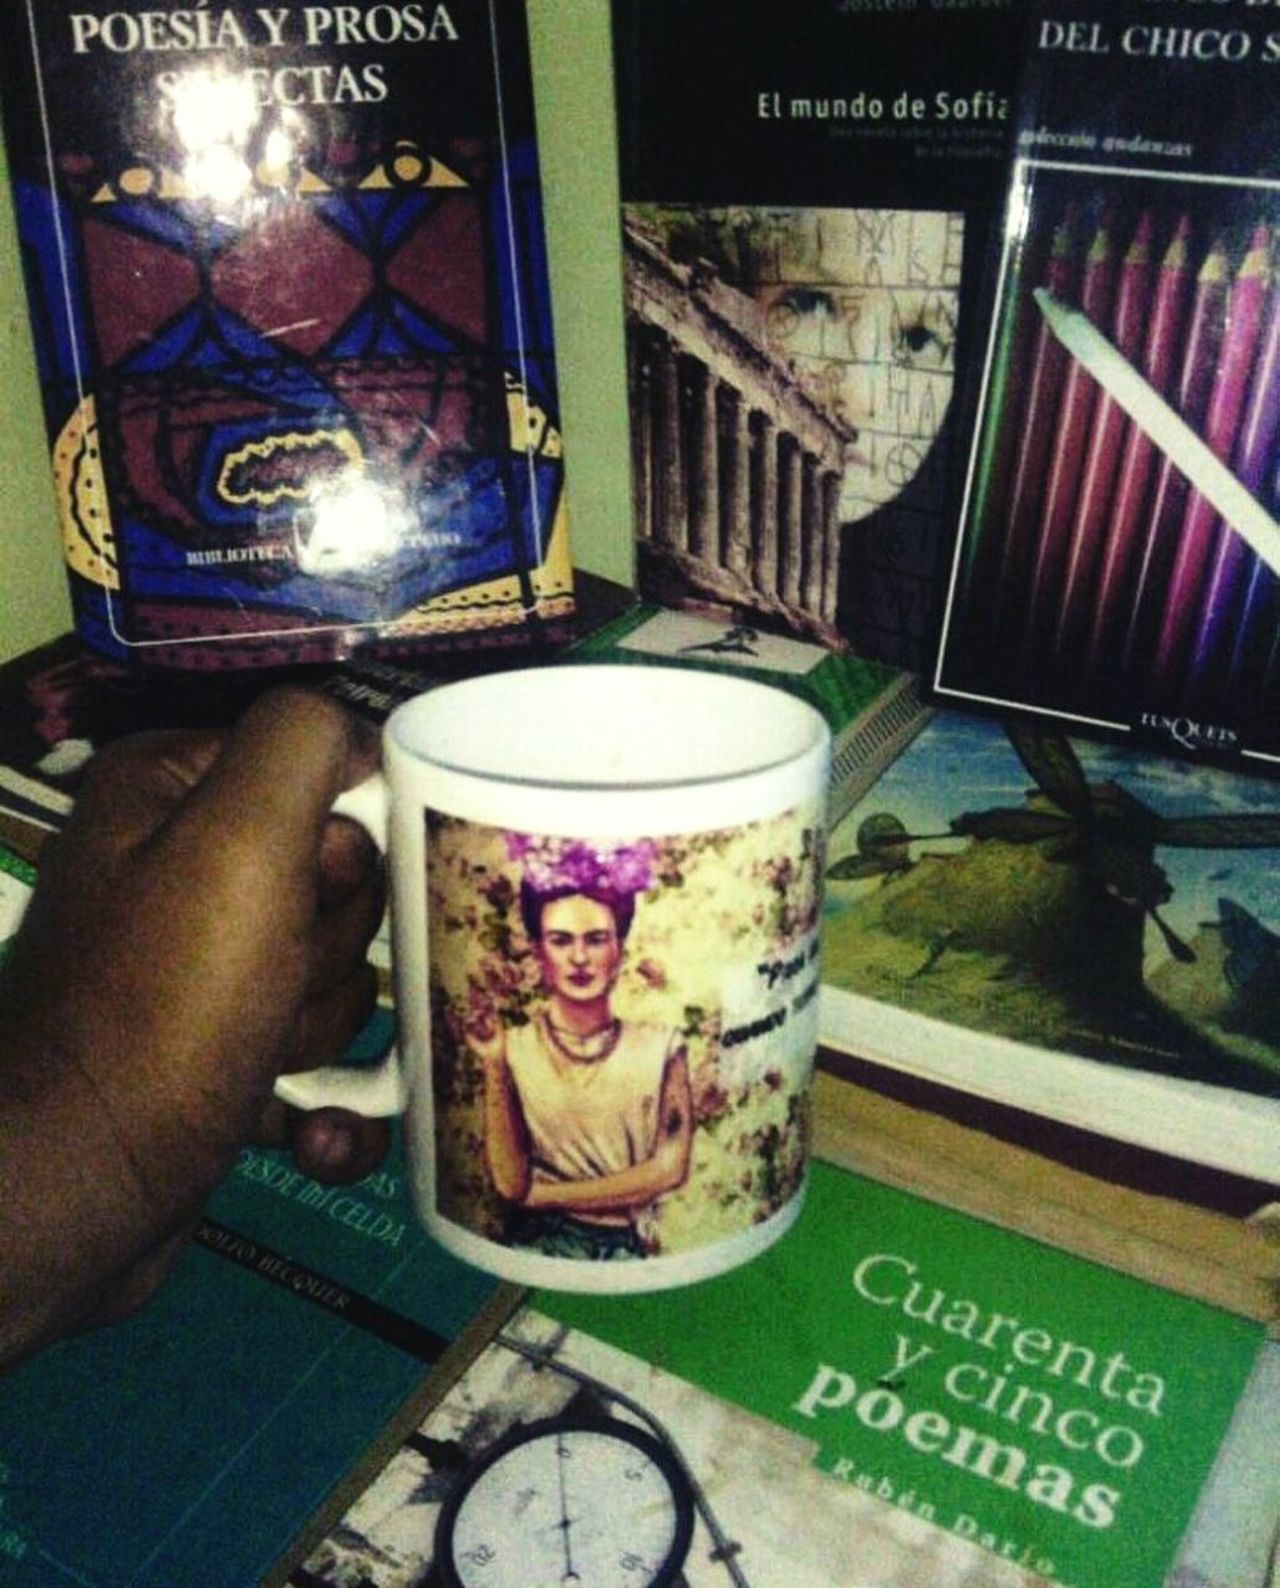 Drink Text Frida Kahlo Coffee ☕ Photography un pequeño cafe con mi frida. 😉😘